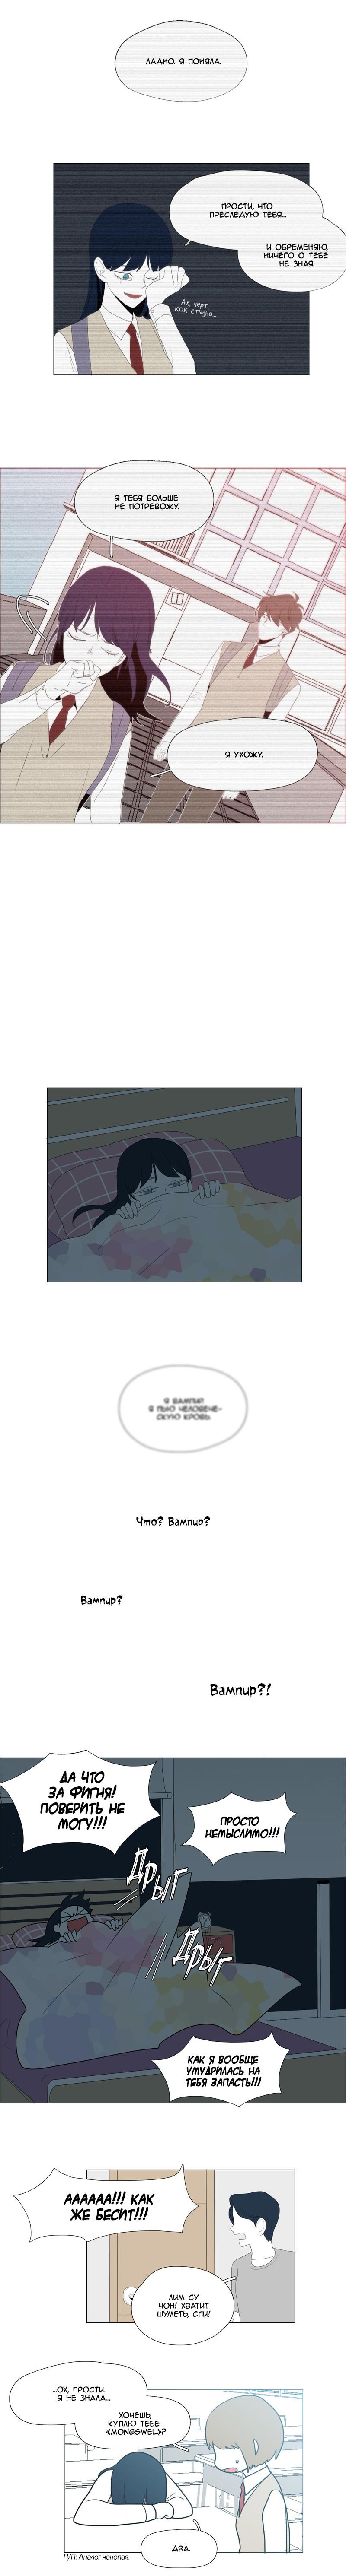 https://r1.ninemanga.com/comics/pic2/33/27873/314050/1481116390334.jpg Page 3